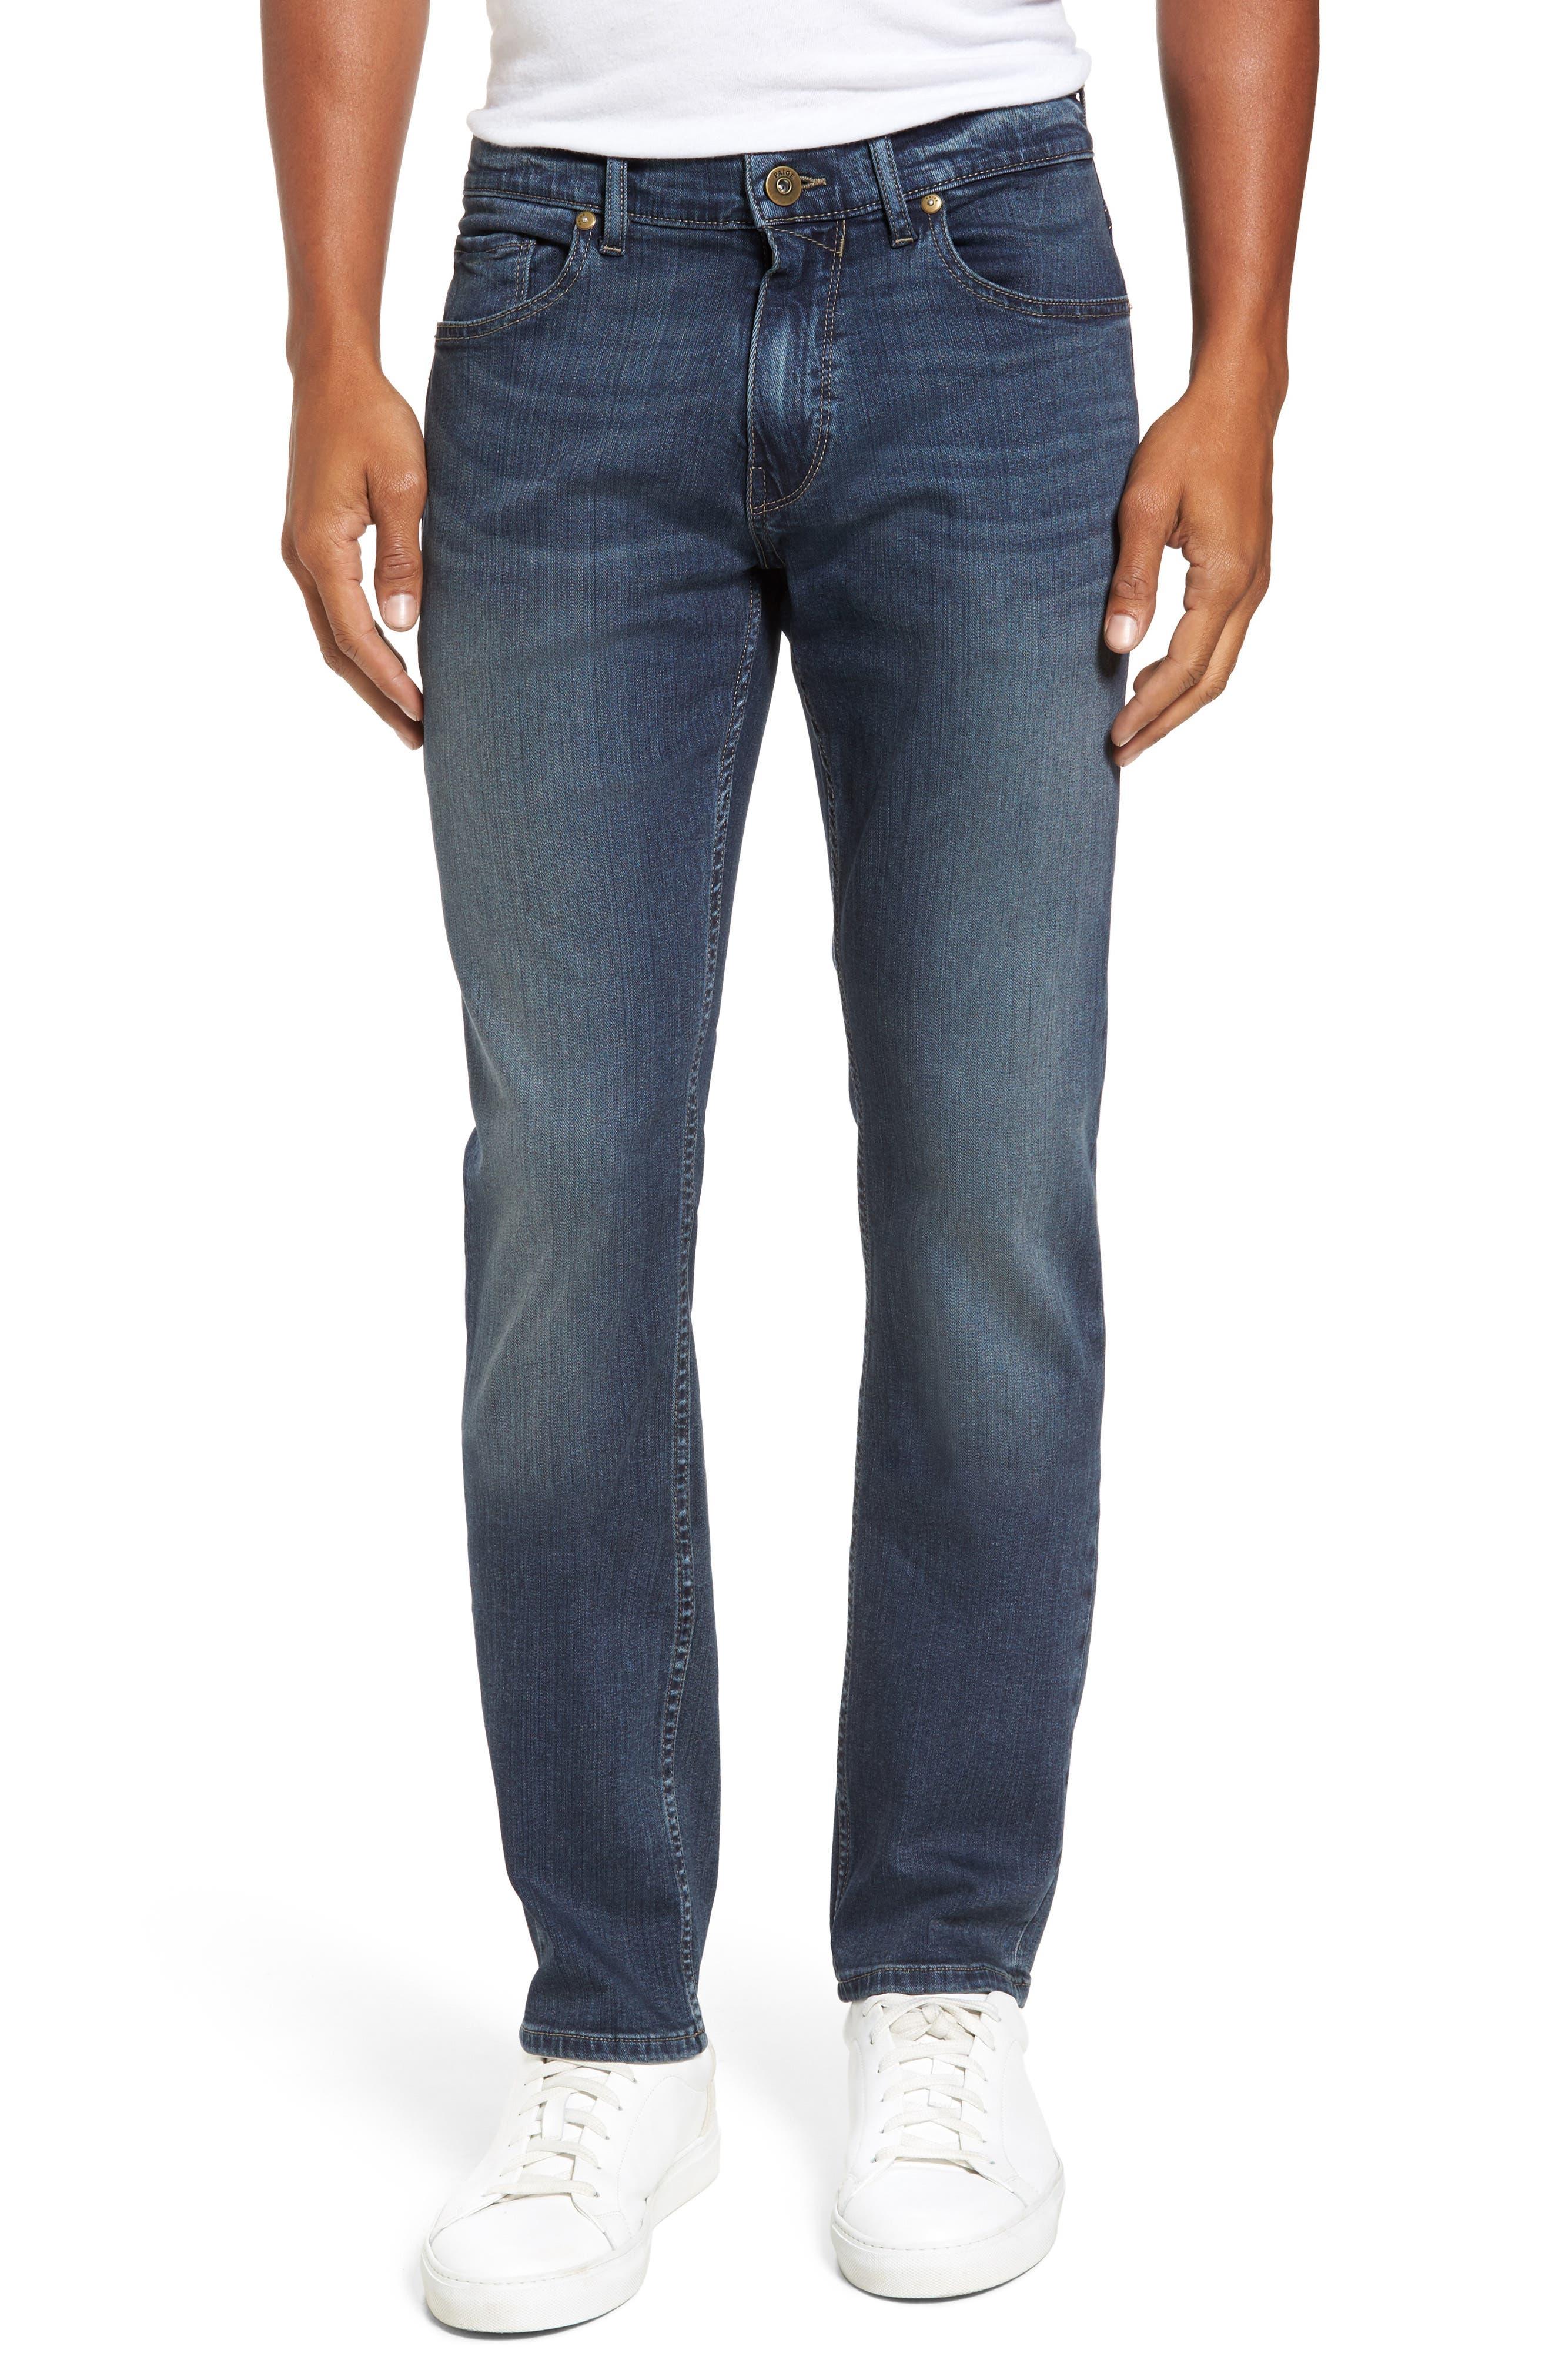 Main Image - PAIGE Transcend - Federal Slim Straight Leg Jeans (Briggs) (Regular & Tall)